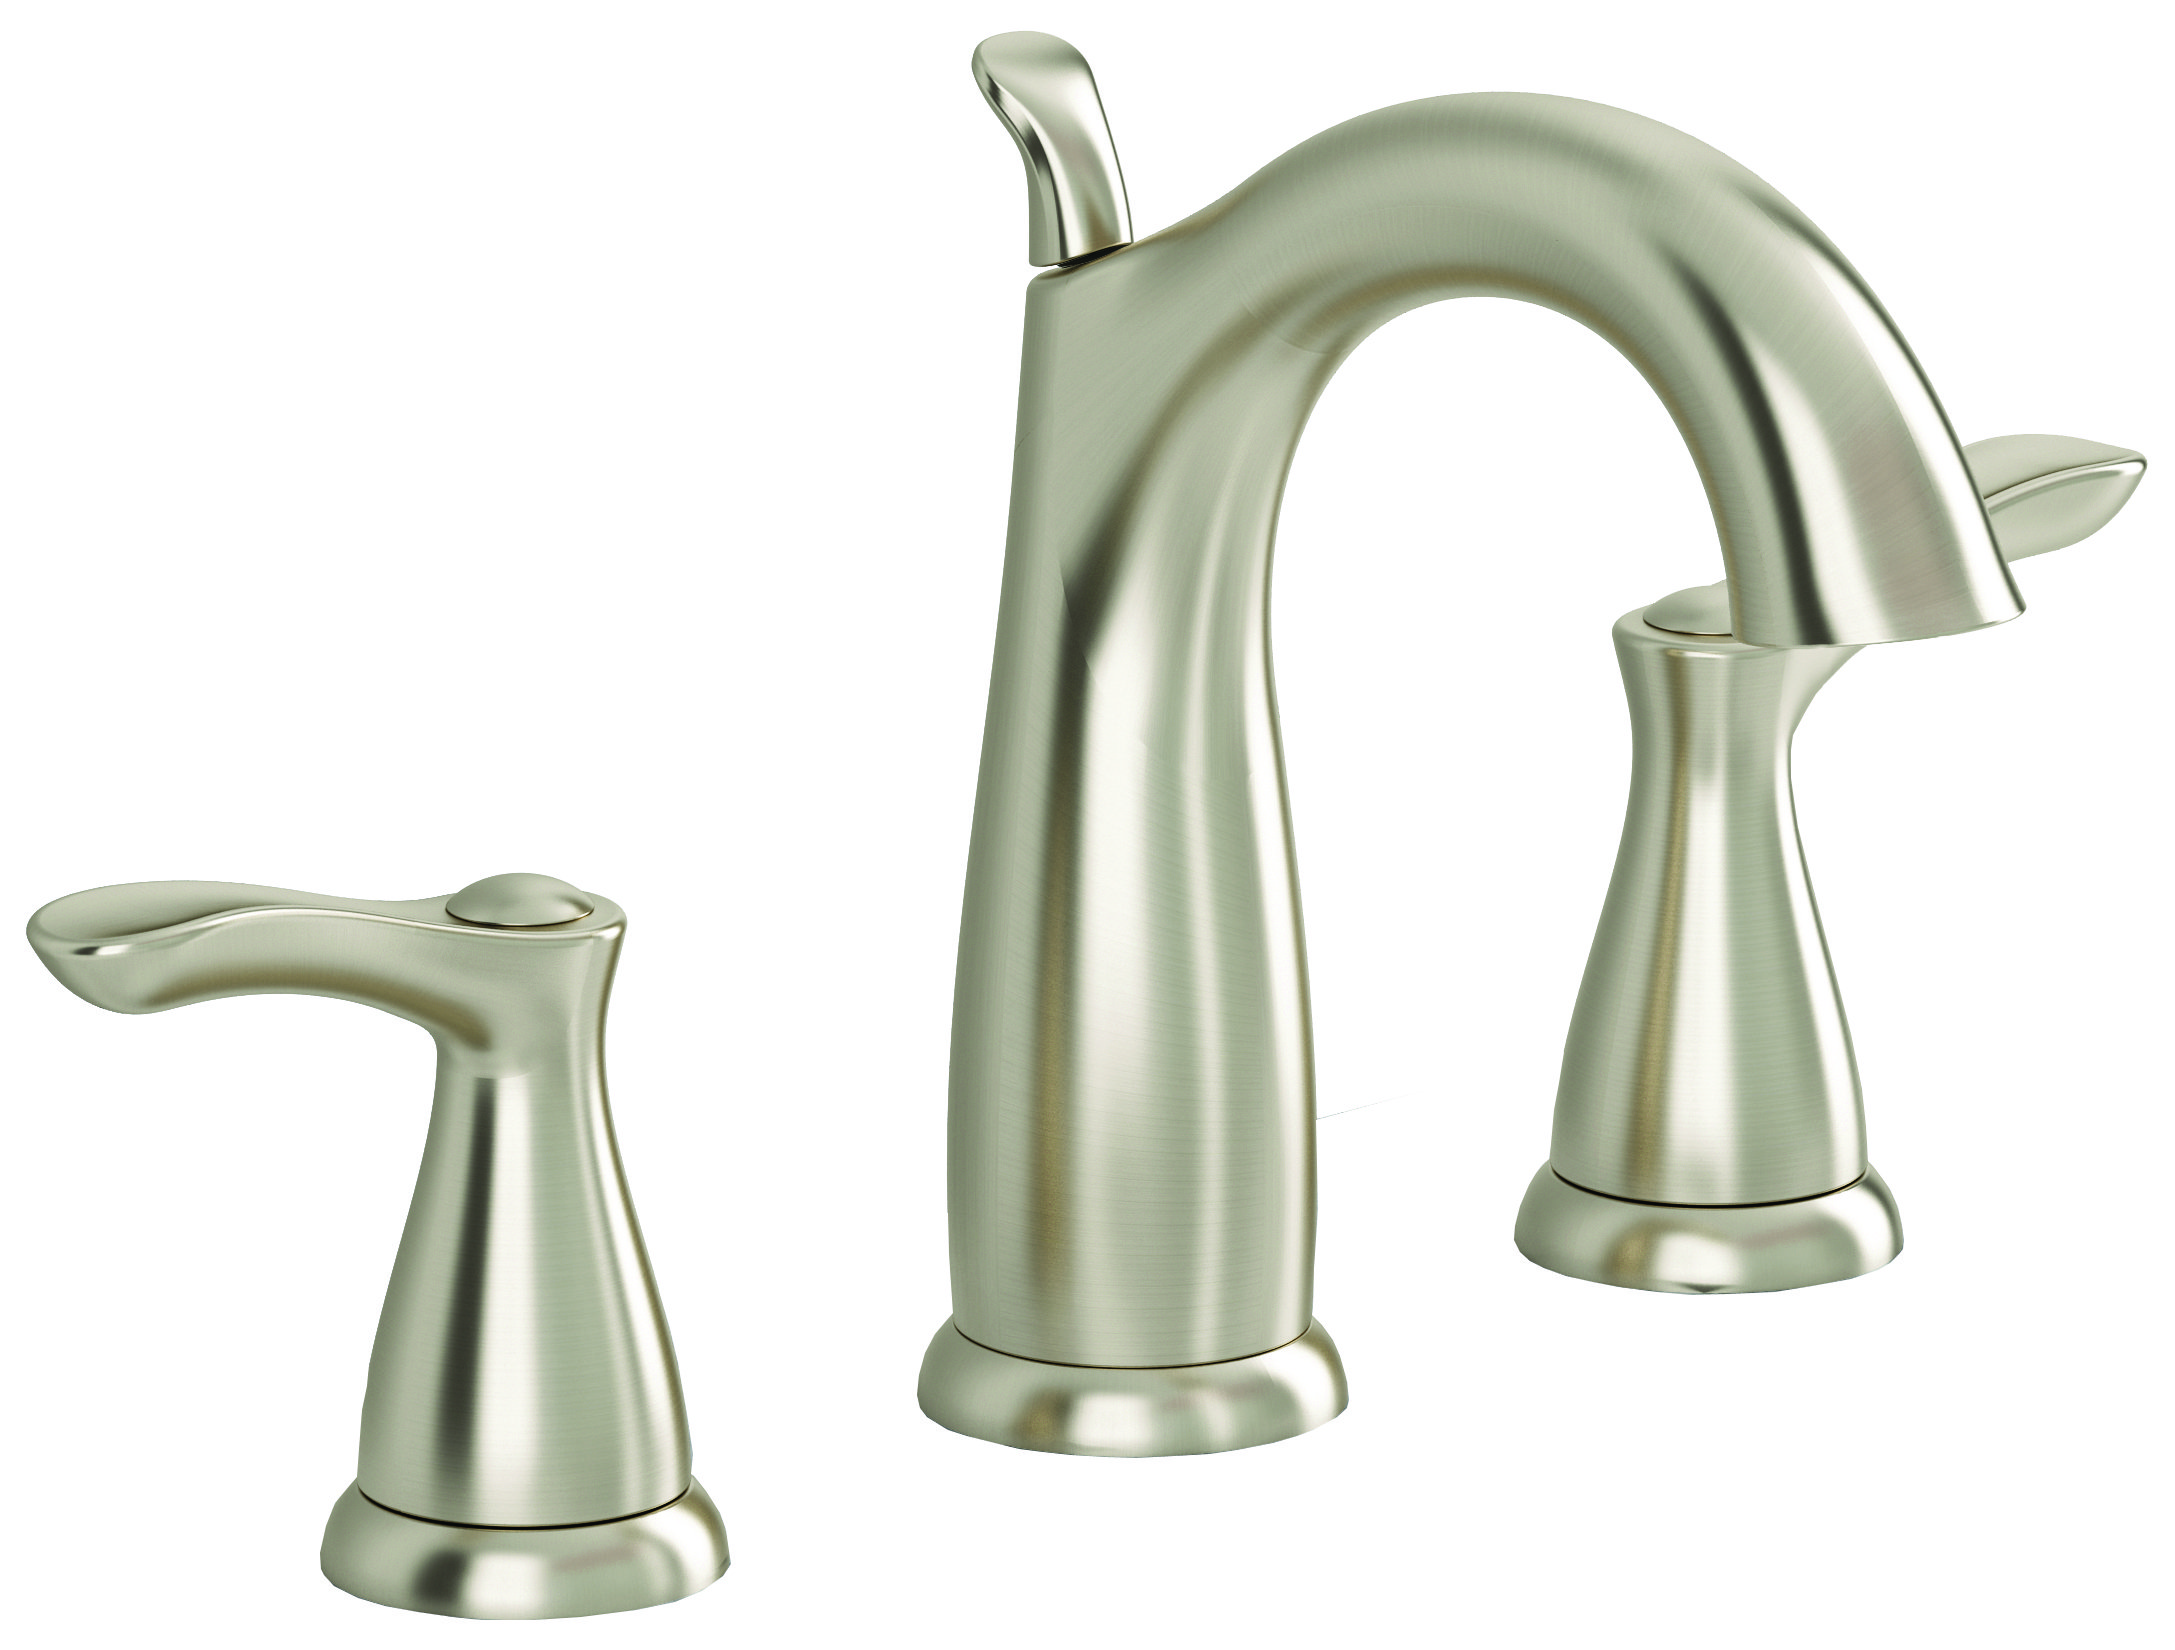 American Standard San Sebastian 8 Inch Two Handle Lavatory Faucet